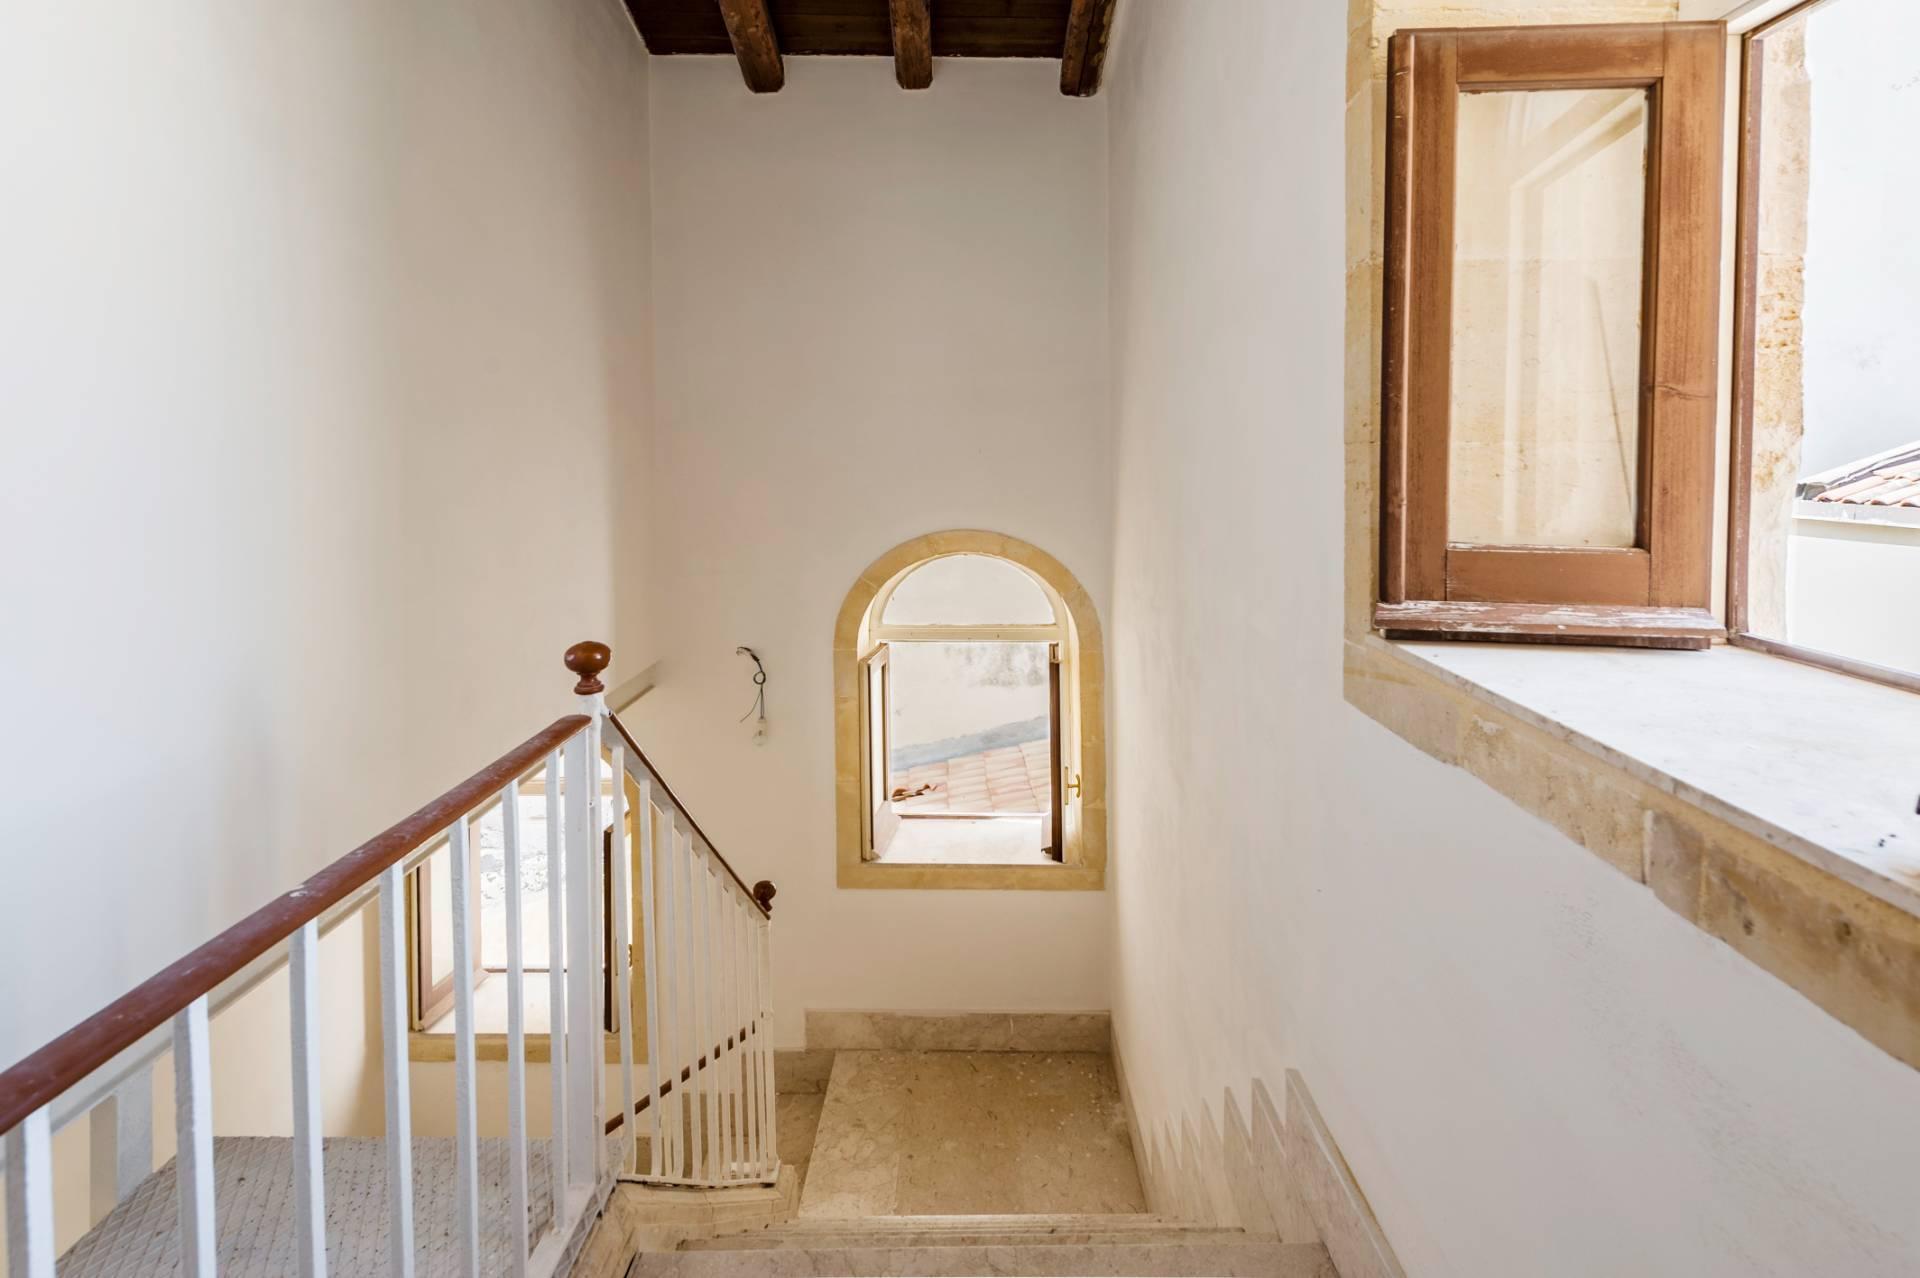 Palazzo in Vendita a Siracusa: 5 locali, 500 mq - Foto 12